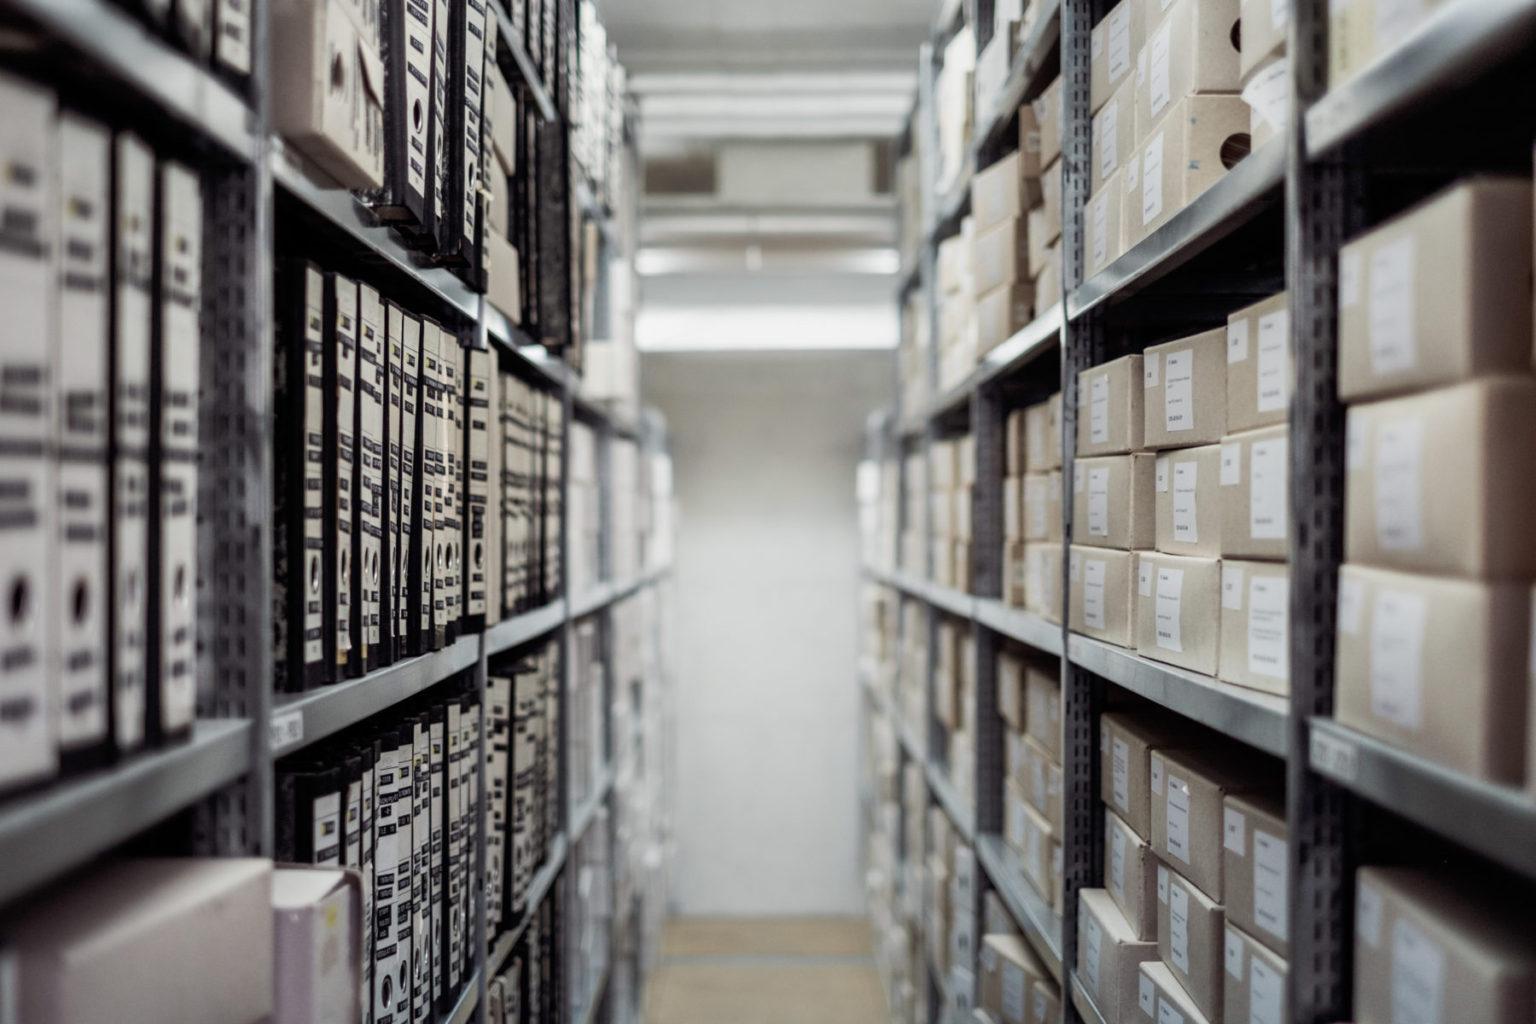 Gestione archivi digitale